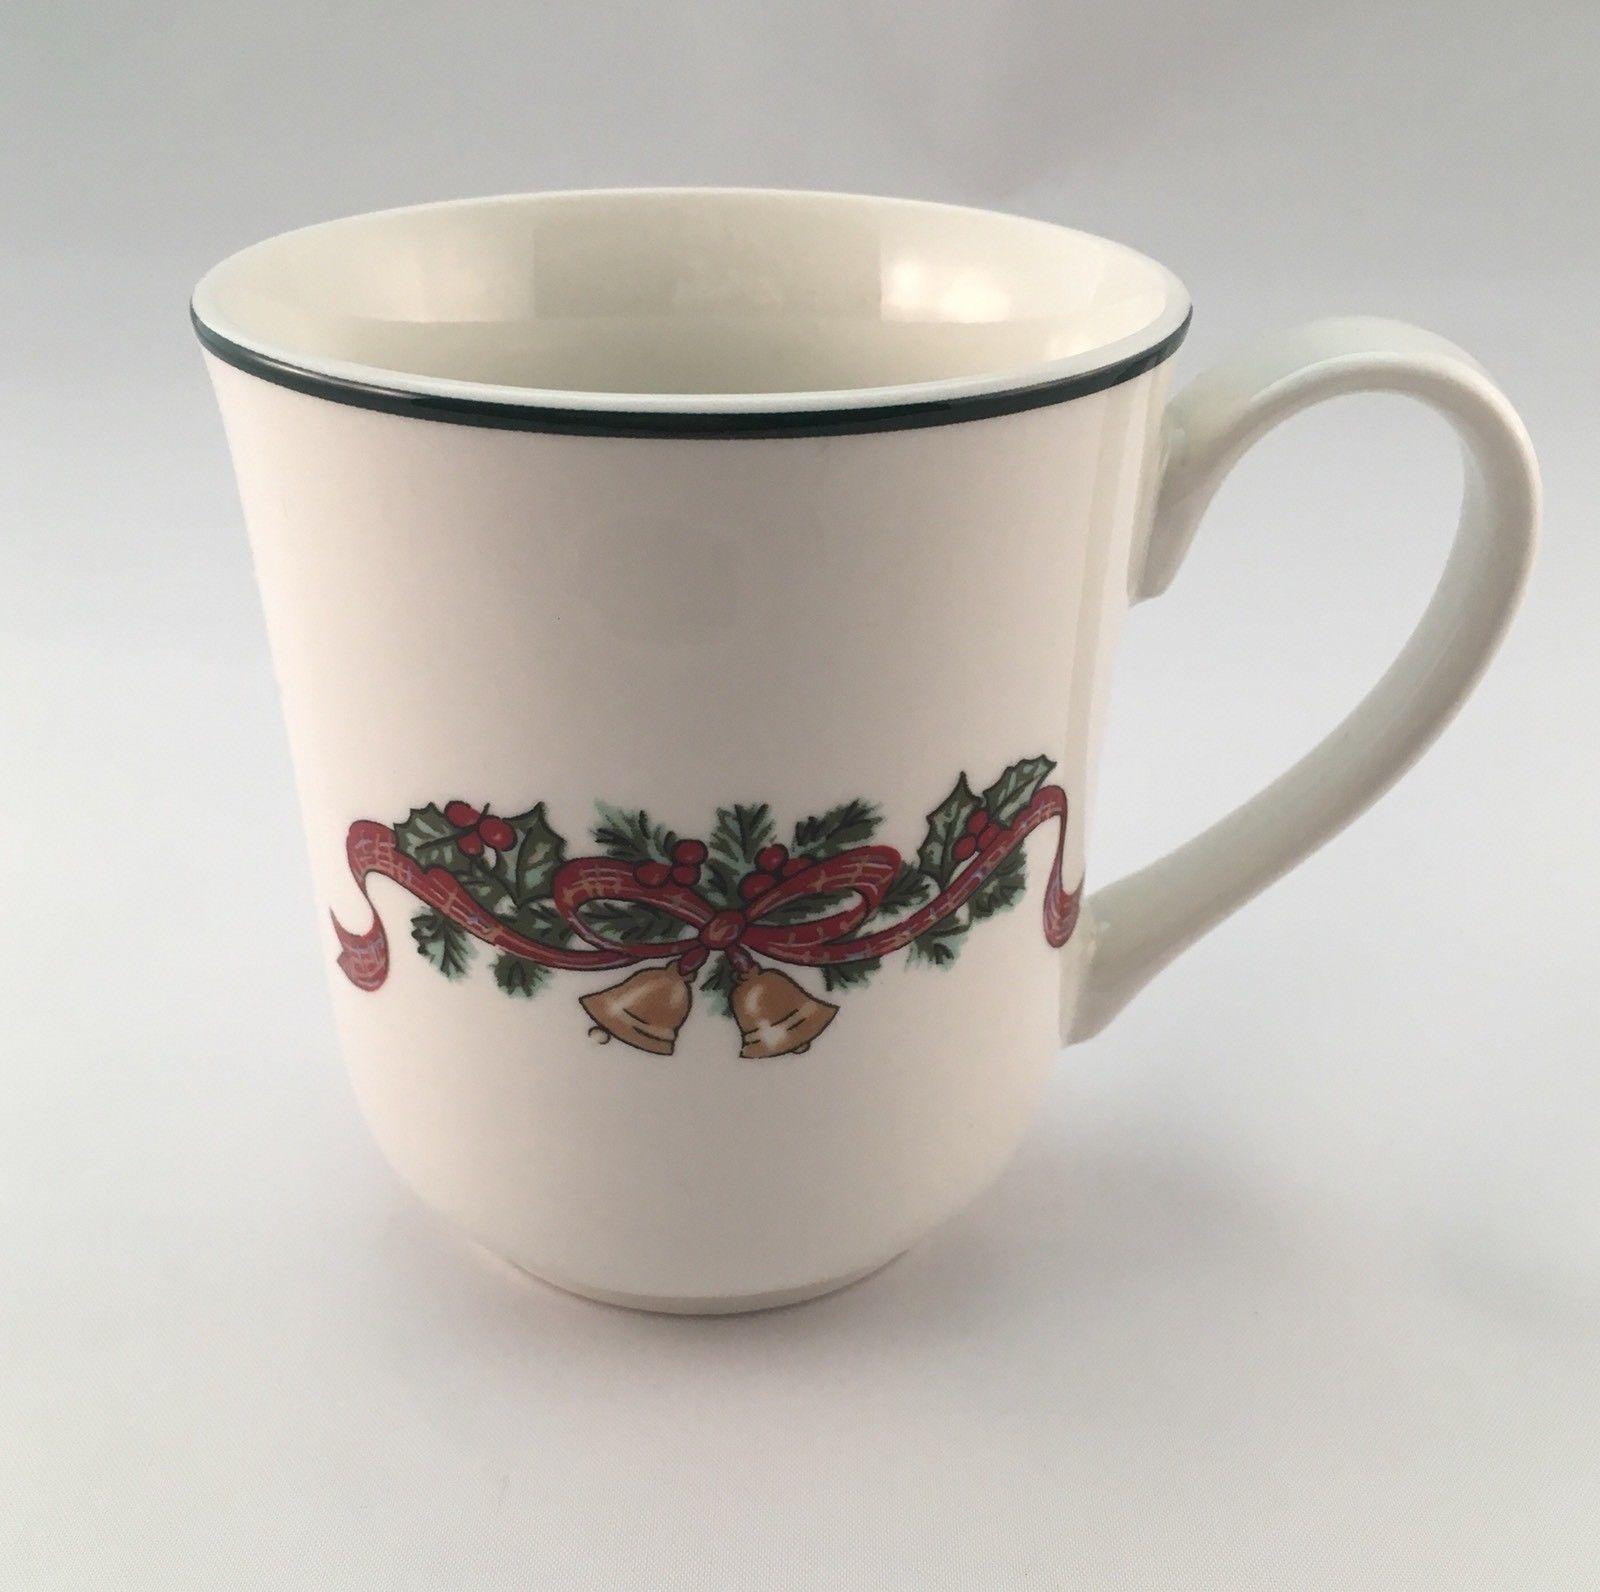 New Johnson Brothers Victorian Christmas Mug and 50 similar items